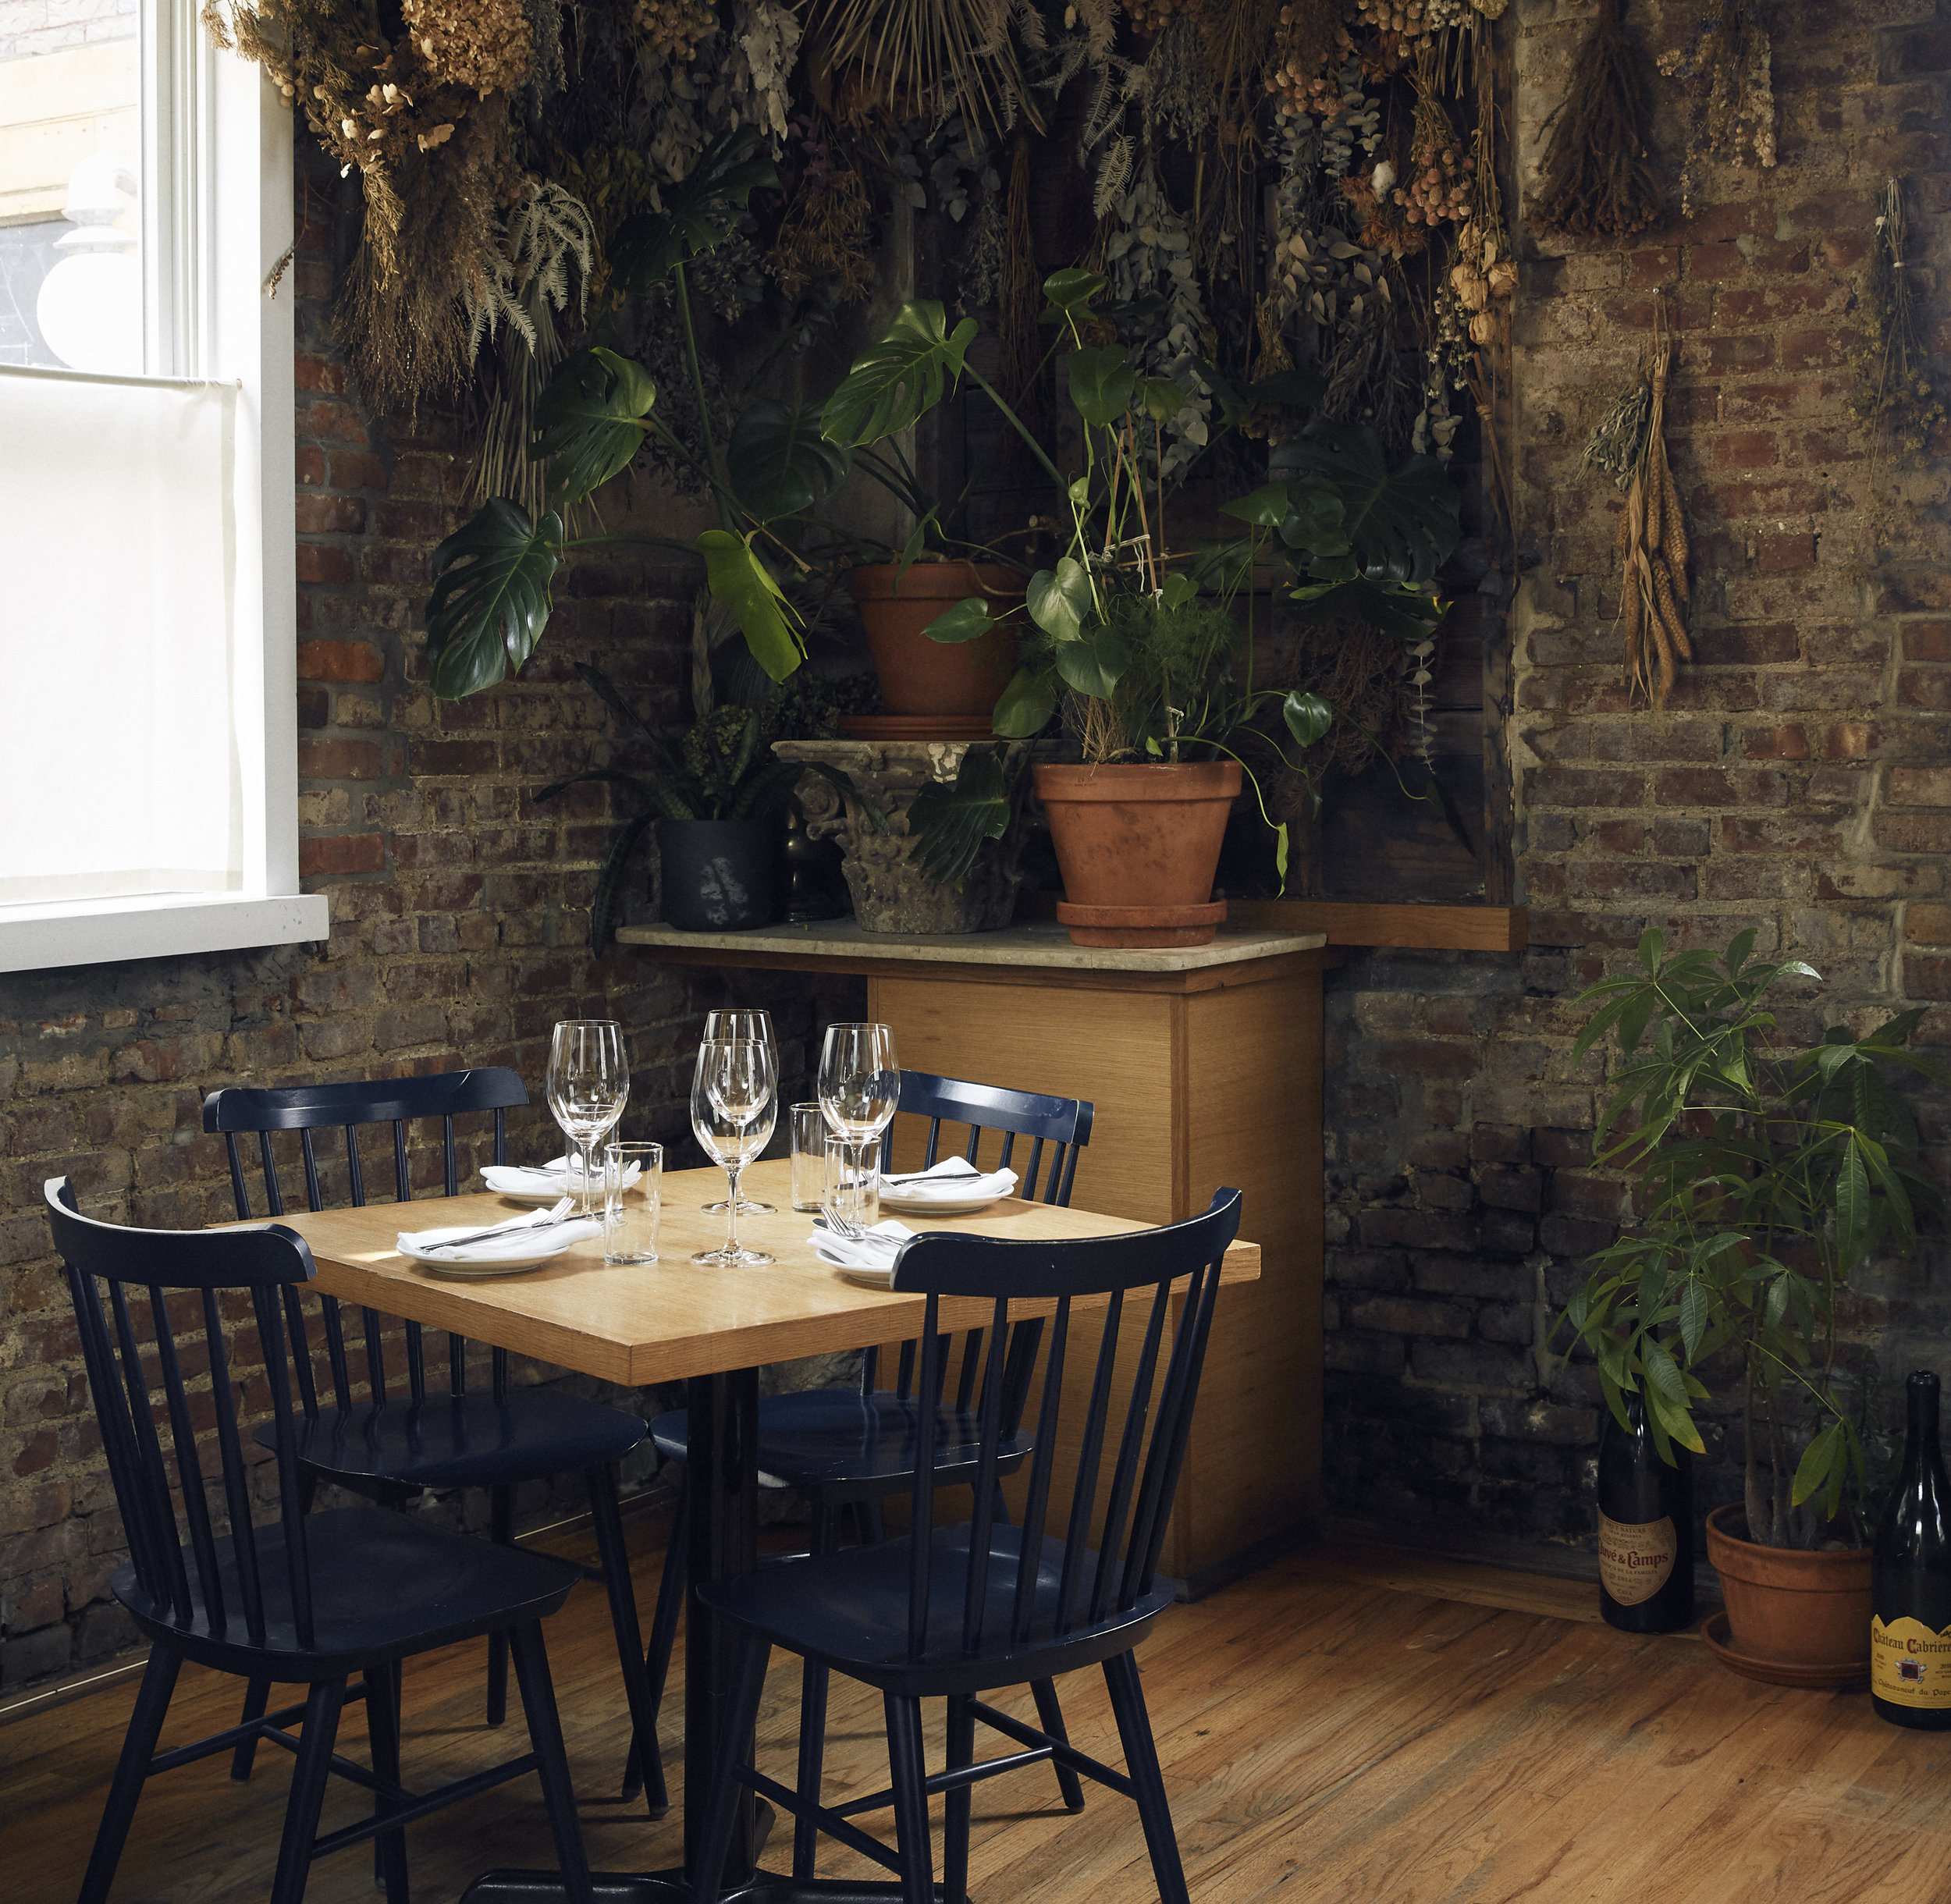 The_Finch_Restaurant_ 2.jpg